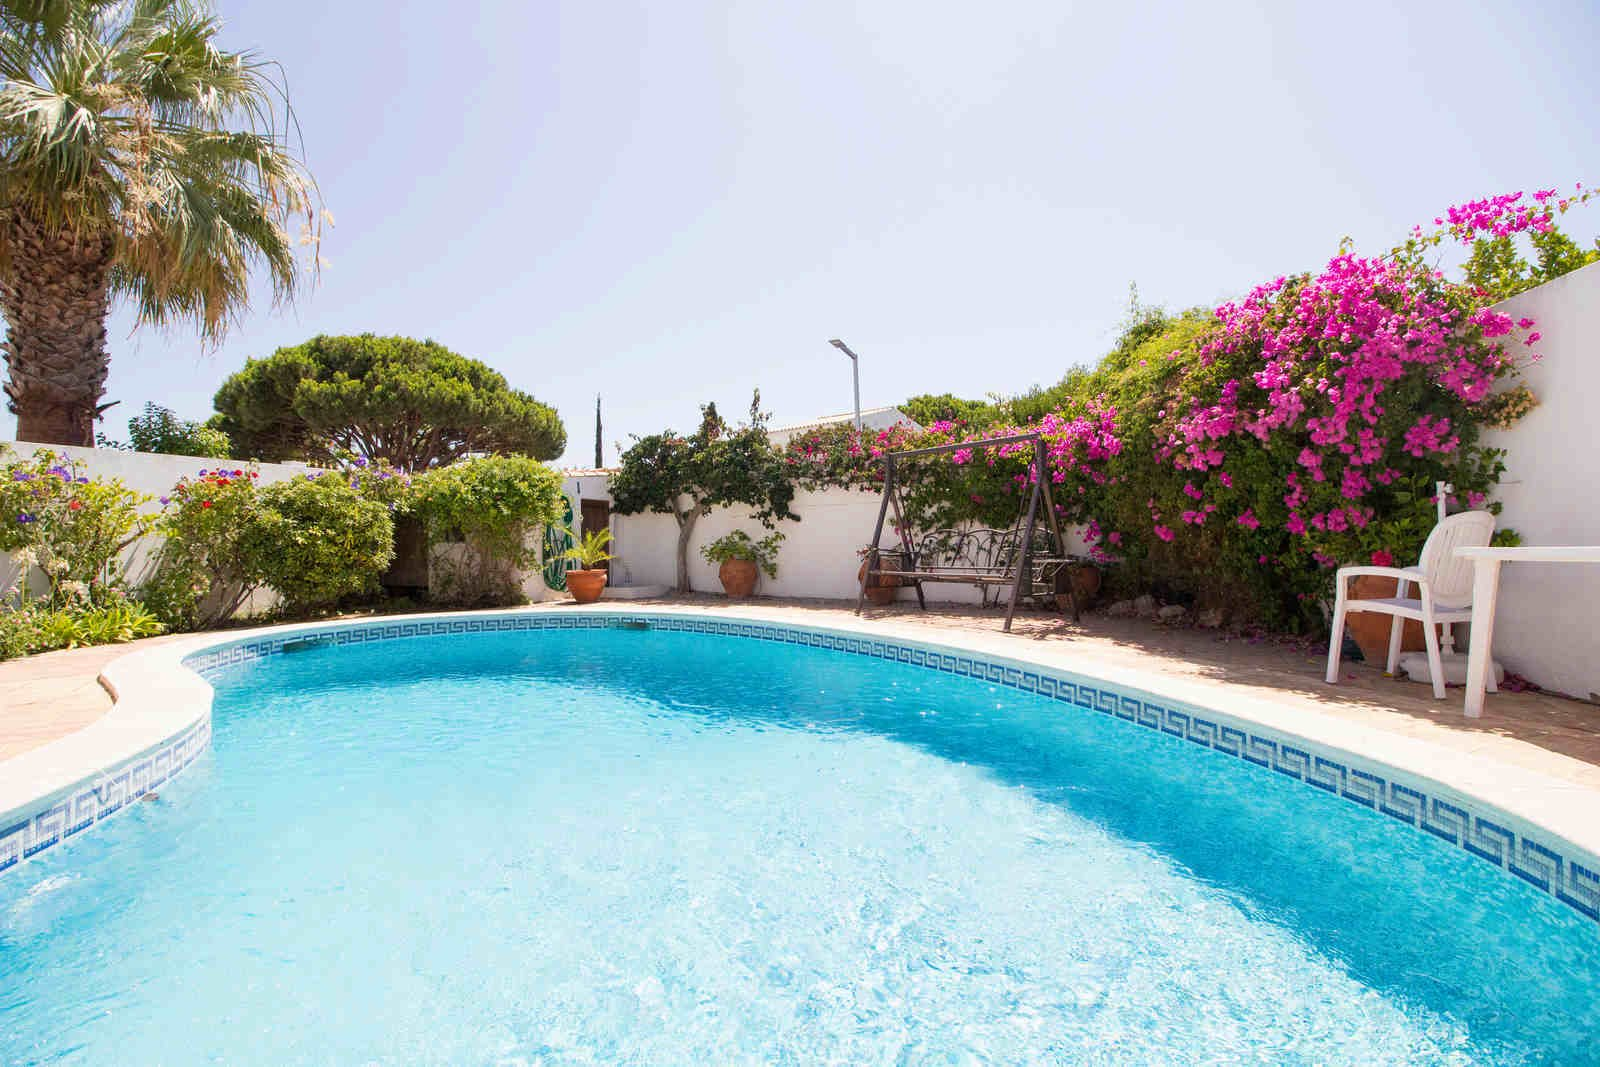 2 Bedroom Villa Almancil, Central Algarve Ref: PV3511